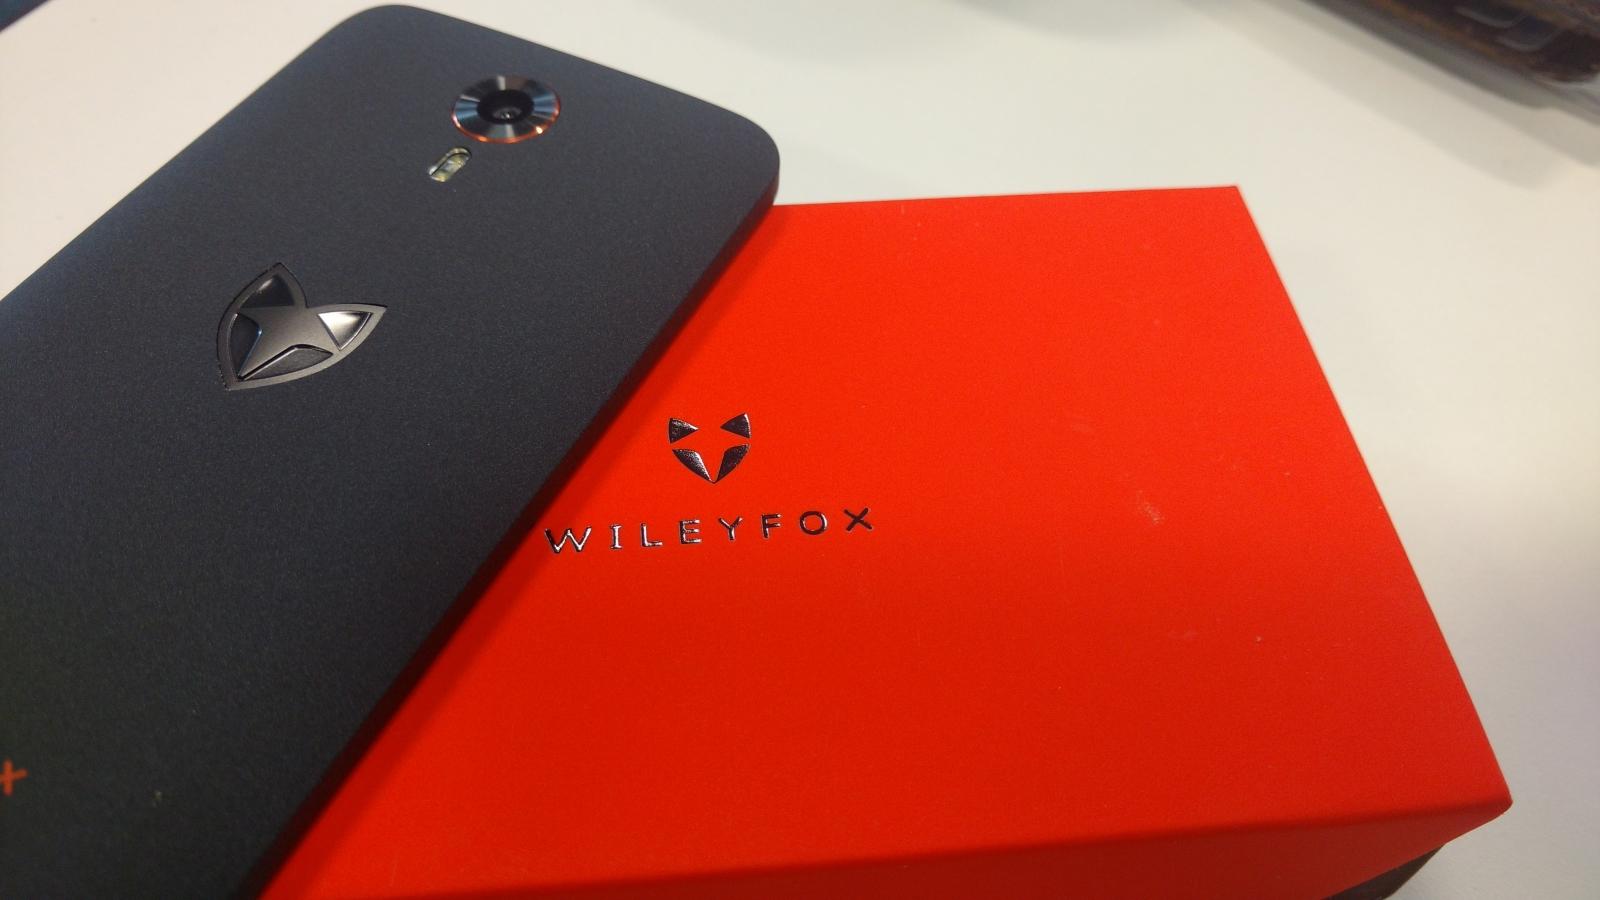 Wileyfox to emulate OnePlus with Cyanogen smartphone